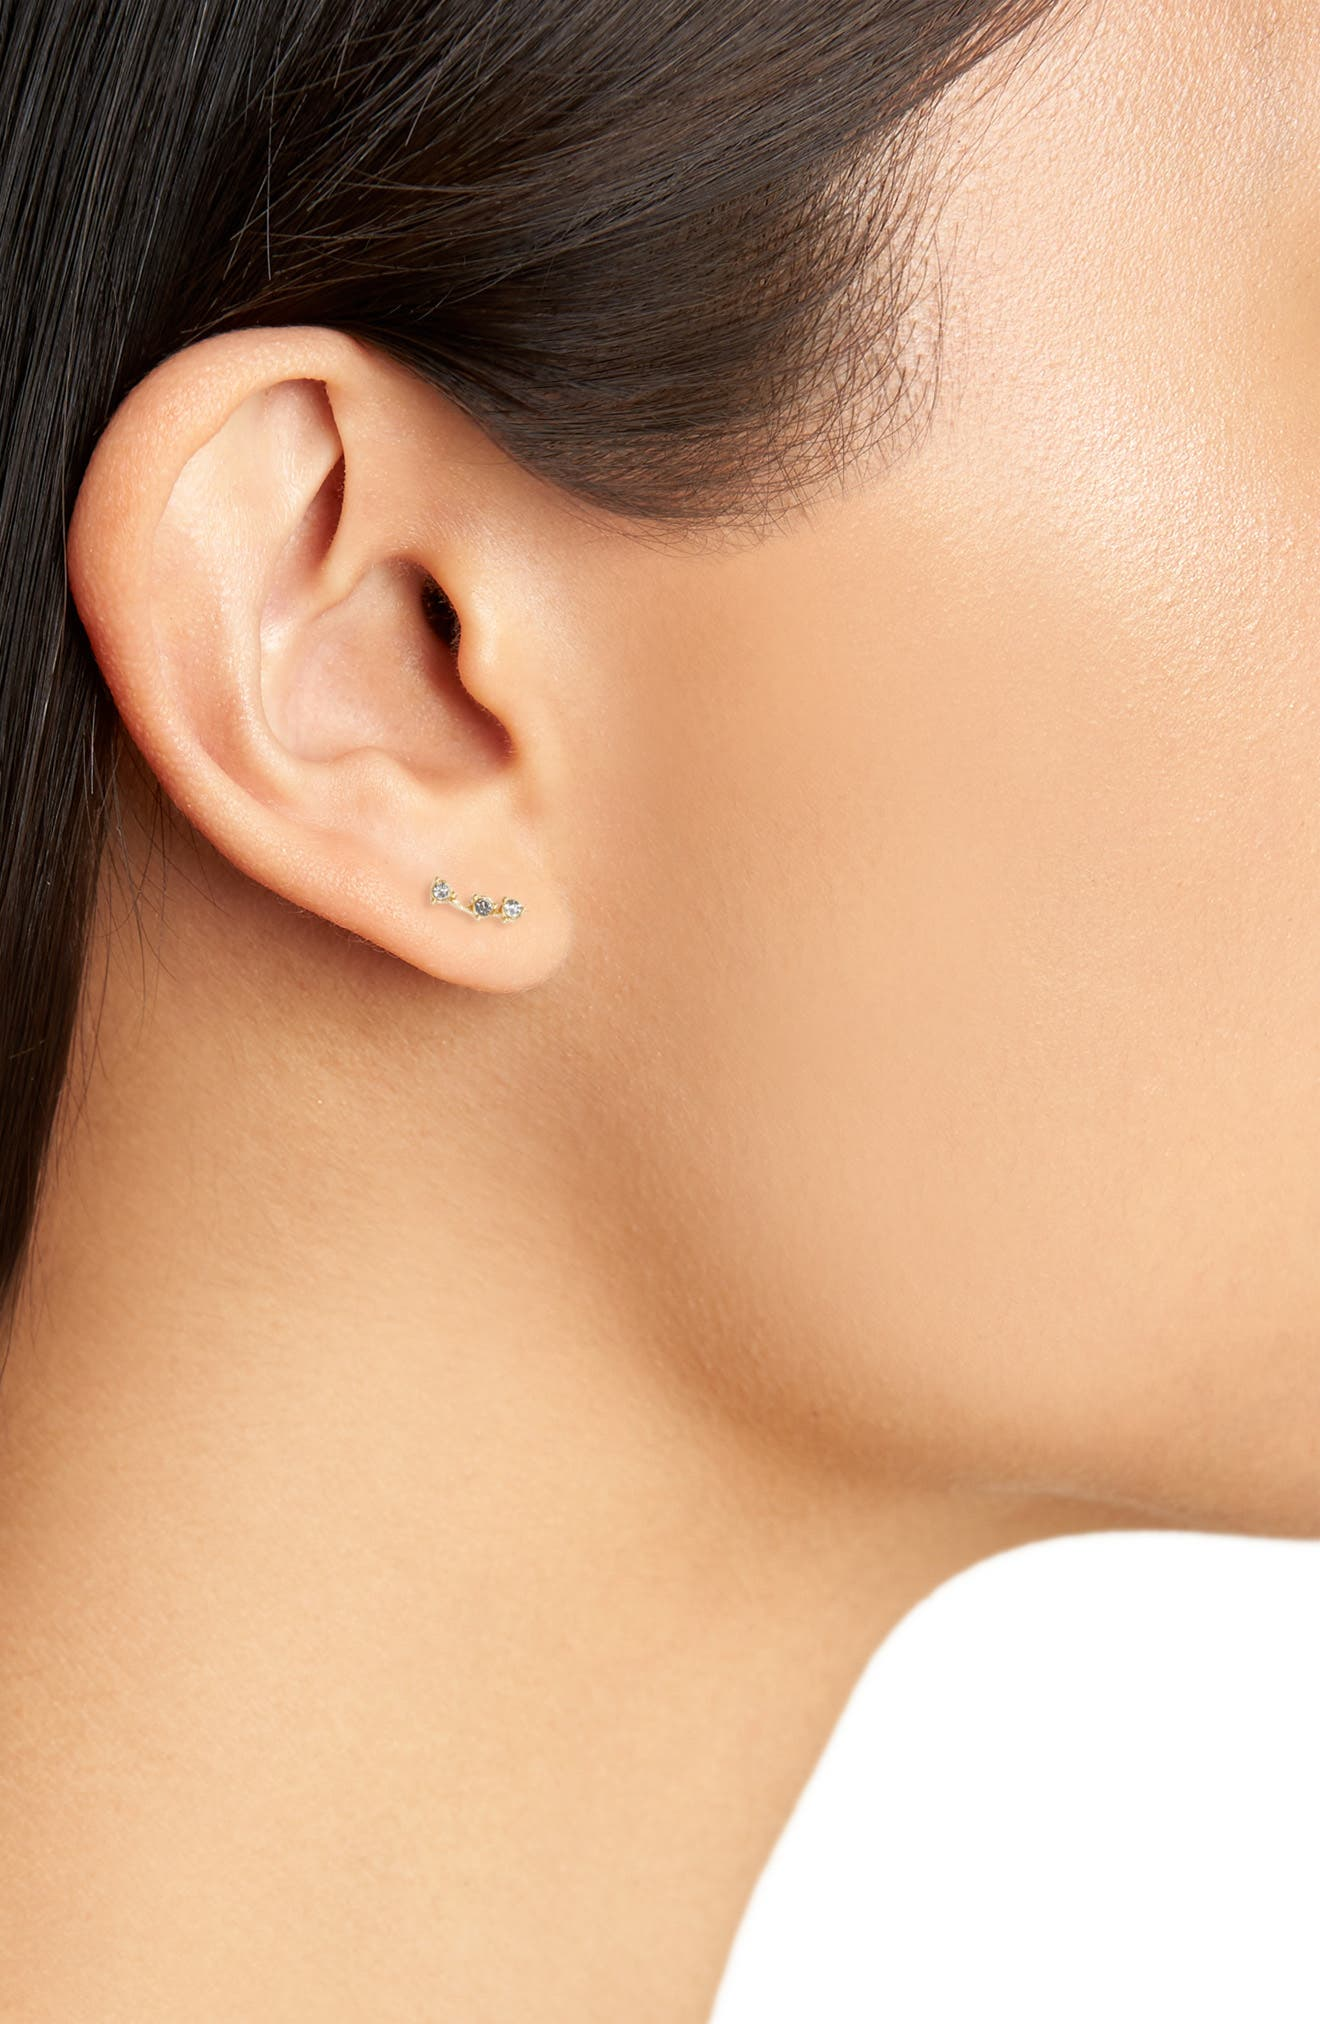 MADEWELL, Gemline Stud Earrings, Alternate thumbnail 2, color, AZTEC